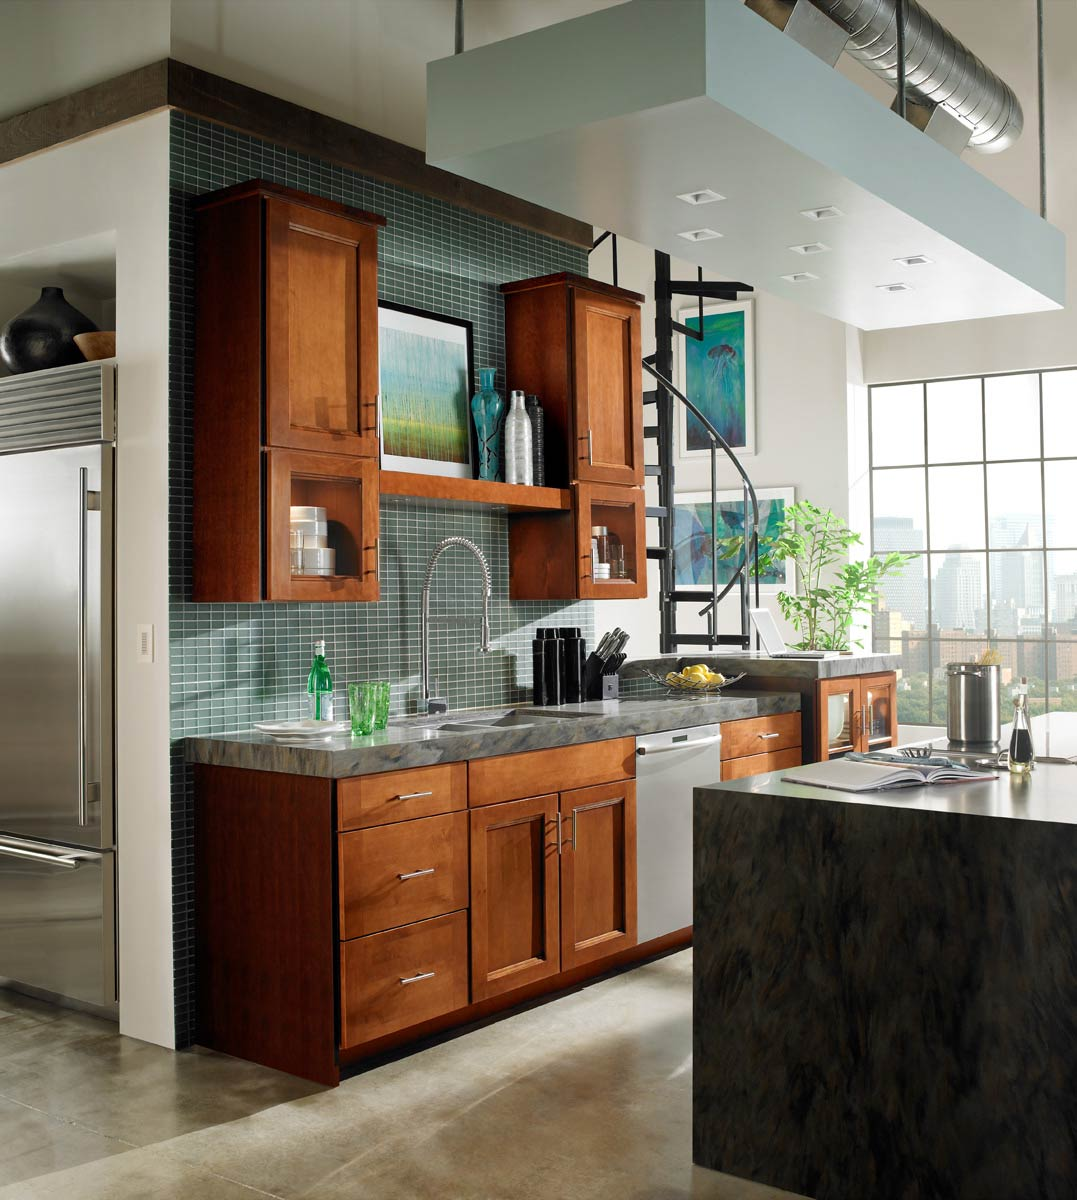 Style In 420 Maple Auburn Glaze Kitchen With Island